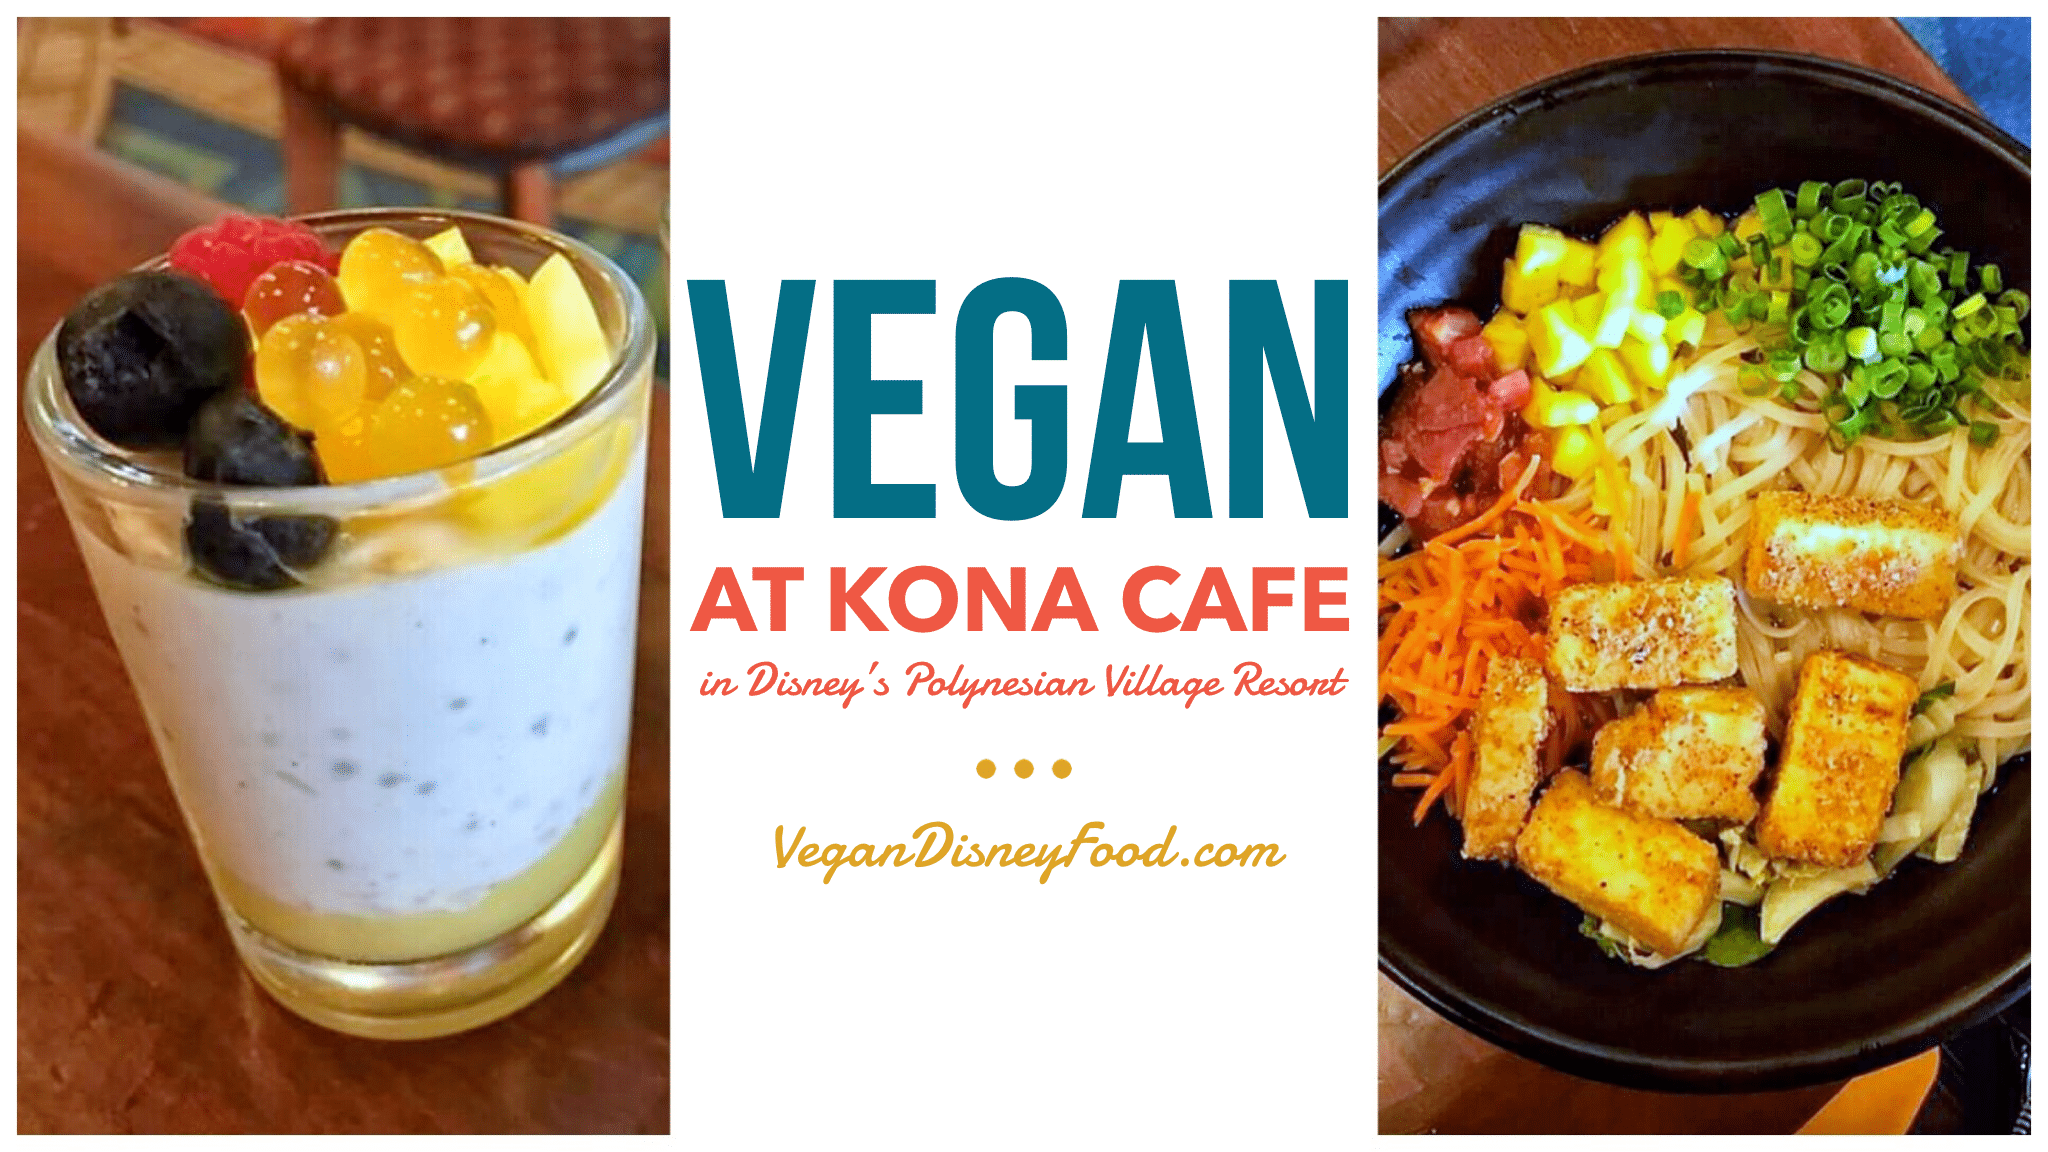 Vegan Options at Kona Cafe in Disney's Polynesian Village Resort at Walt Disney World